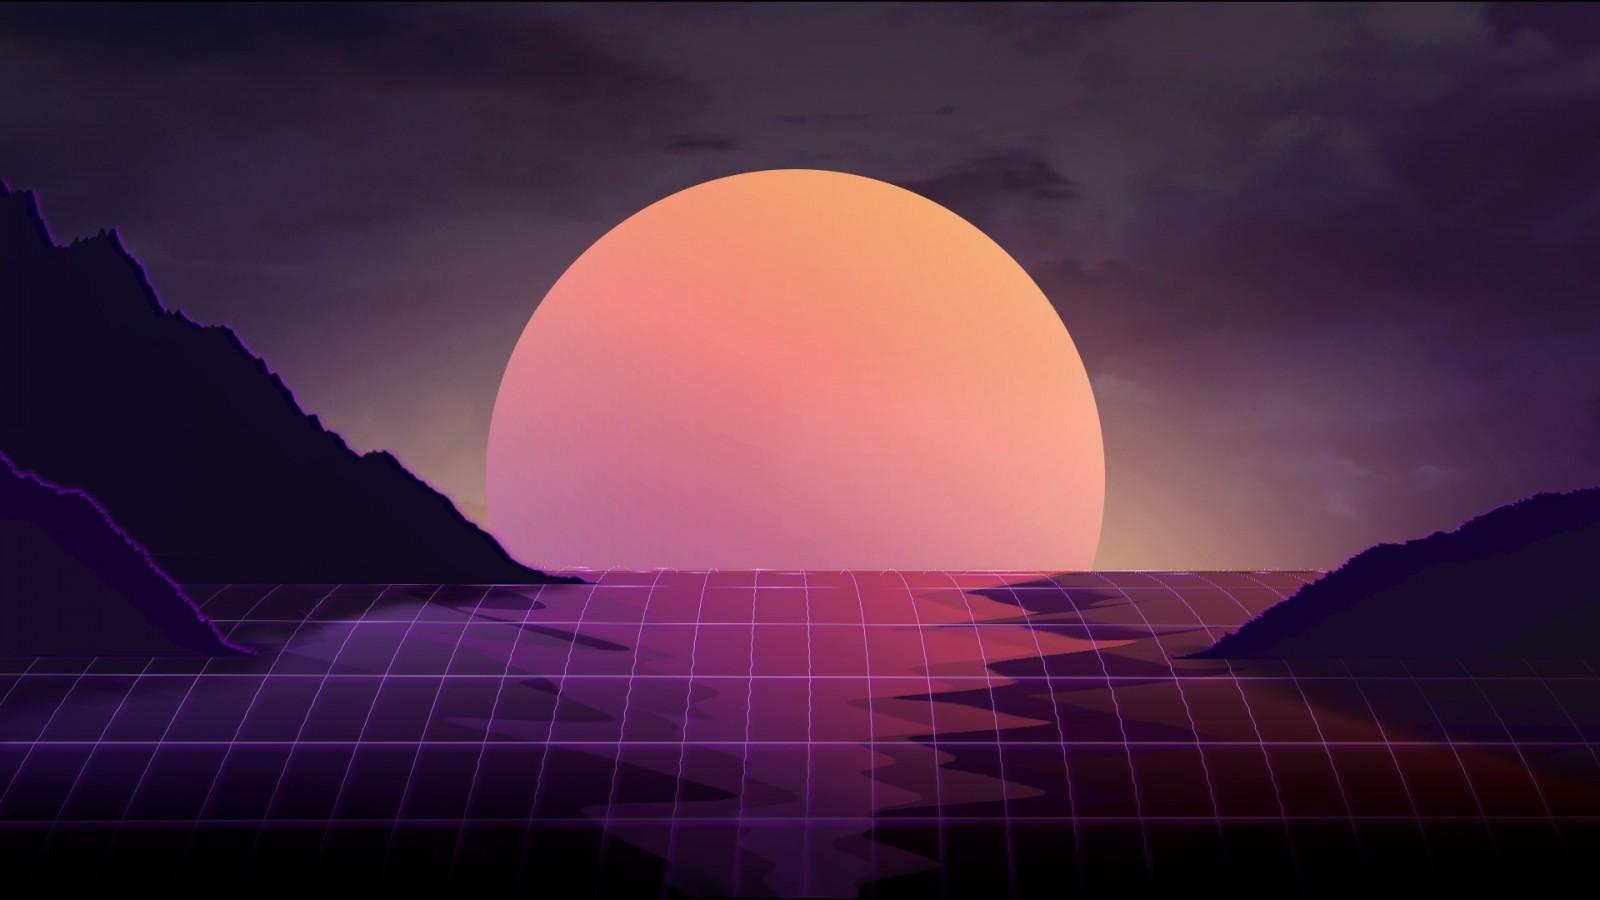 Cute Alien Wallpaper Iphone Neon Sunset Hd Wallpapers Hd Wallpapers Id 22902